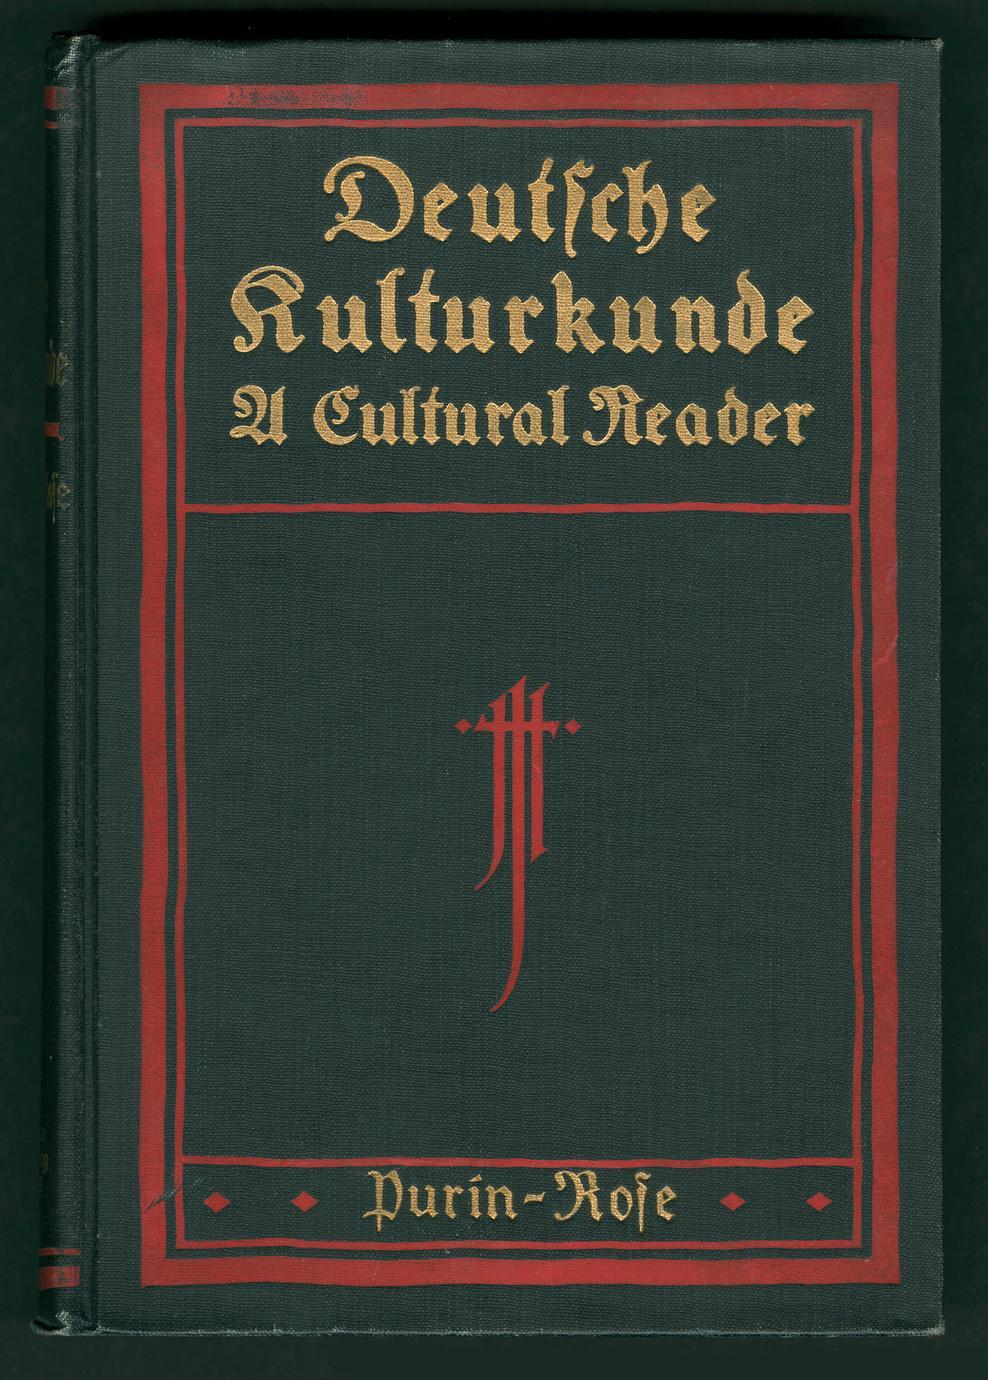 Deutsche kulturkunde : a cultural reader (1 of 3)